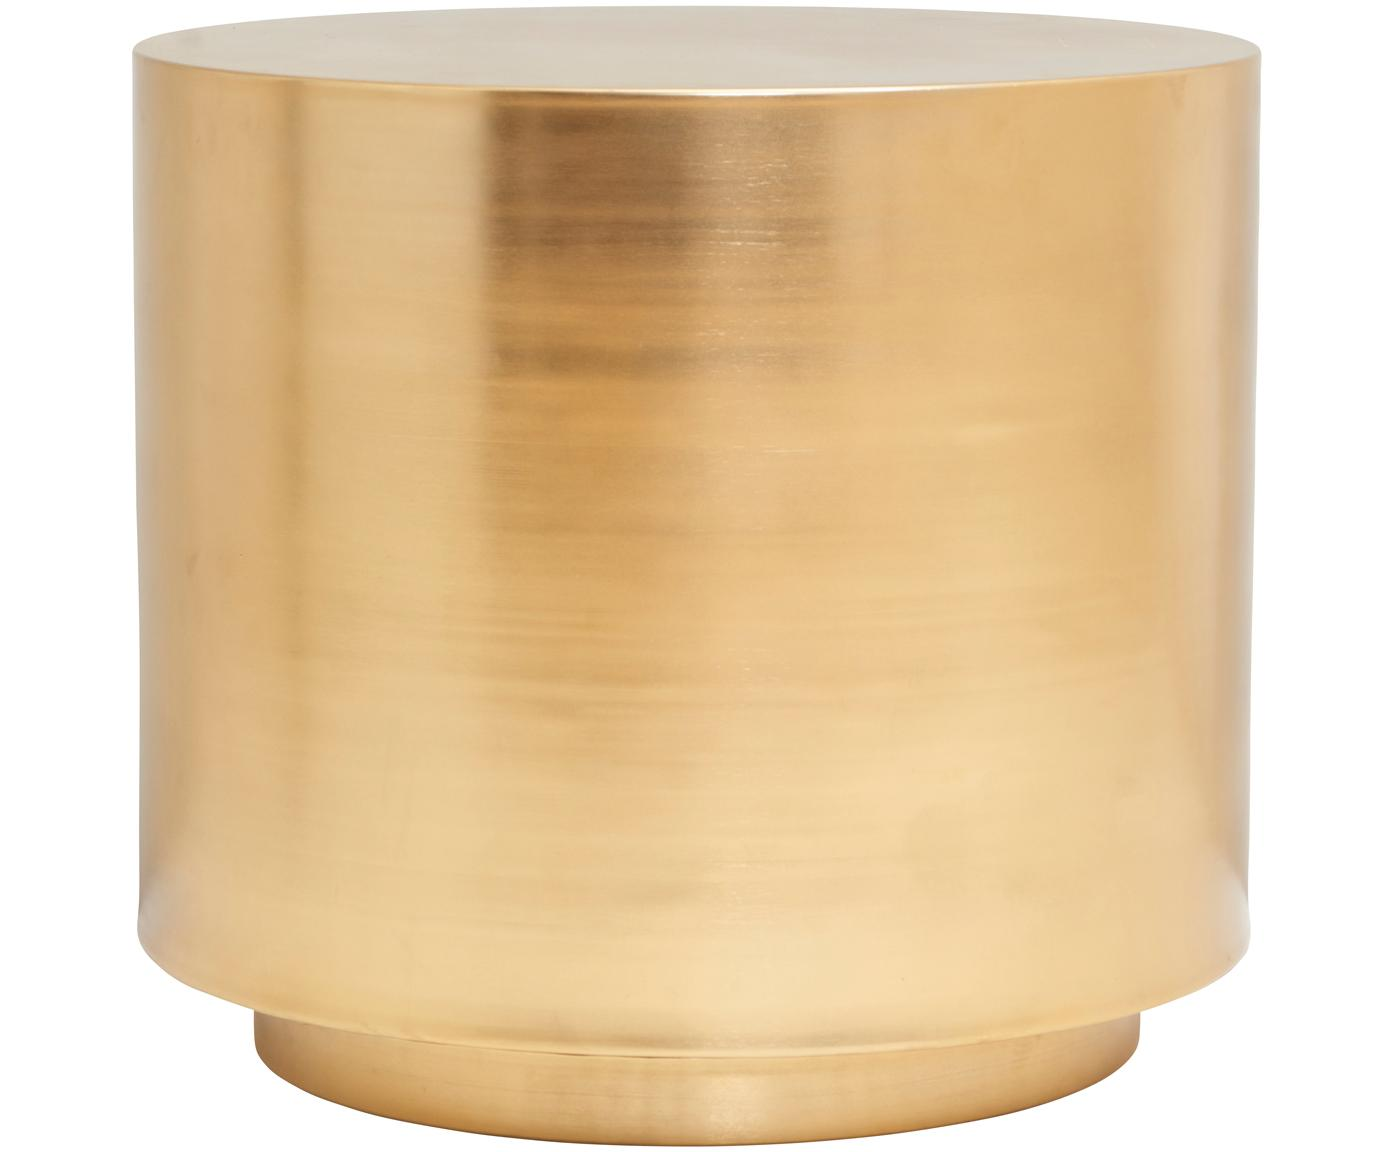 Beistelltisch Step aus Messing, Metall, gebürstet, Messing, Ø 50 x H 46 cm